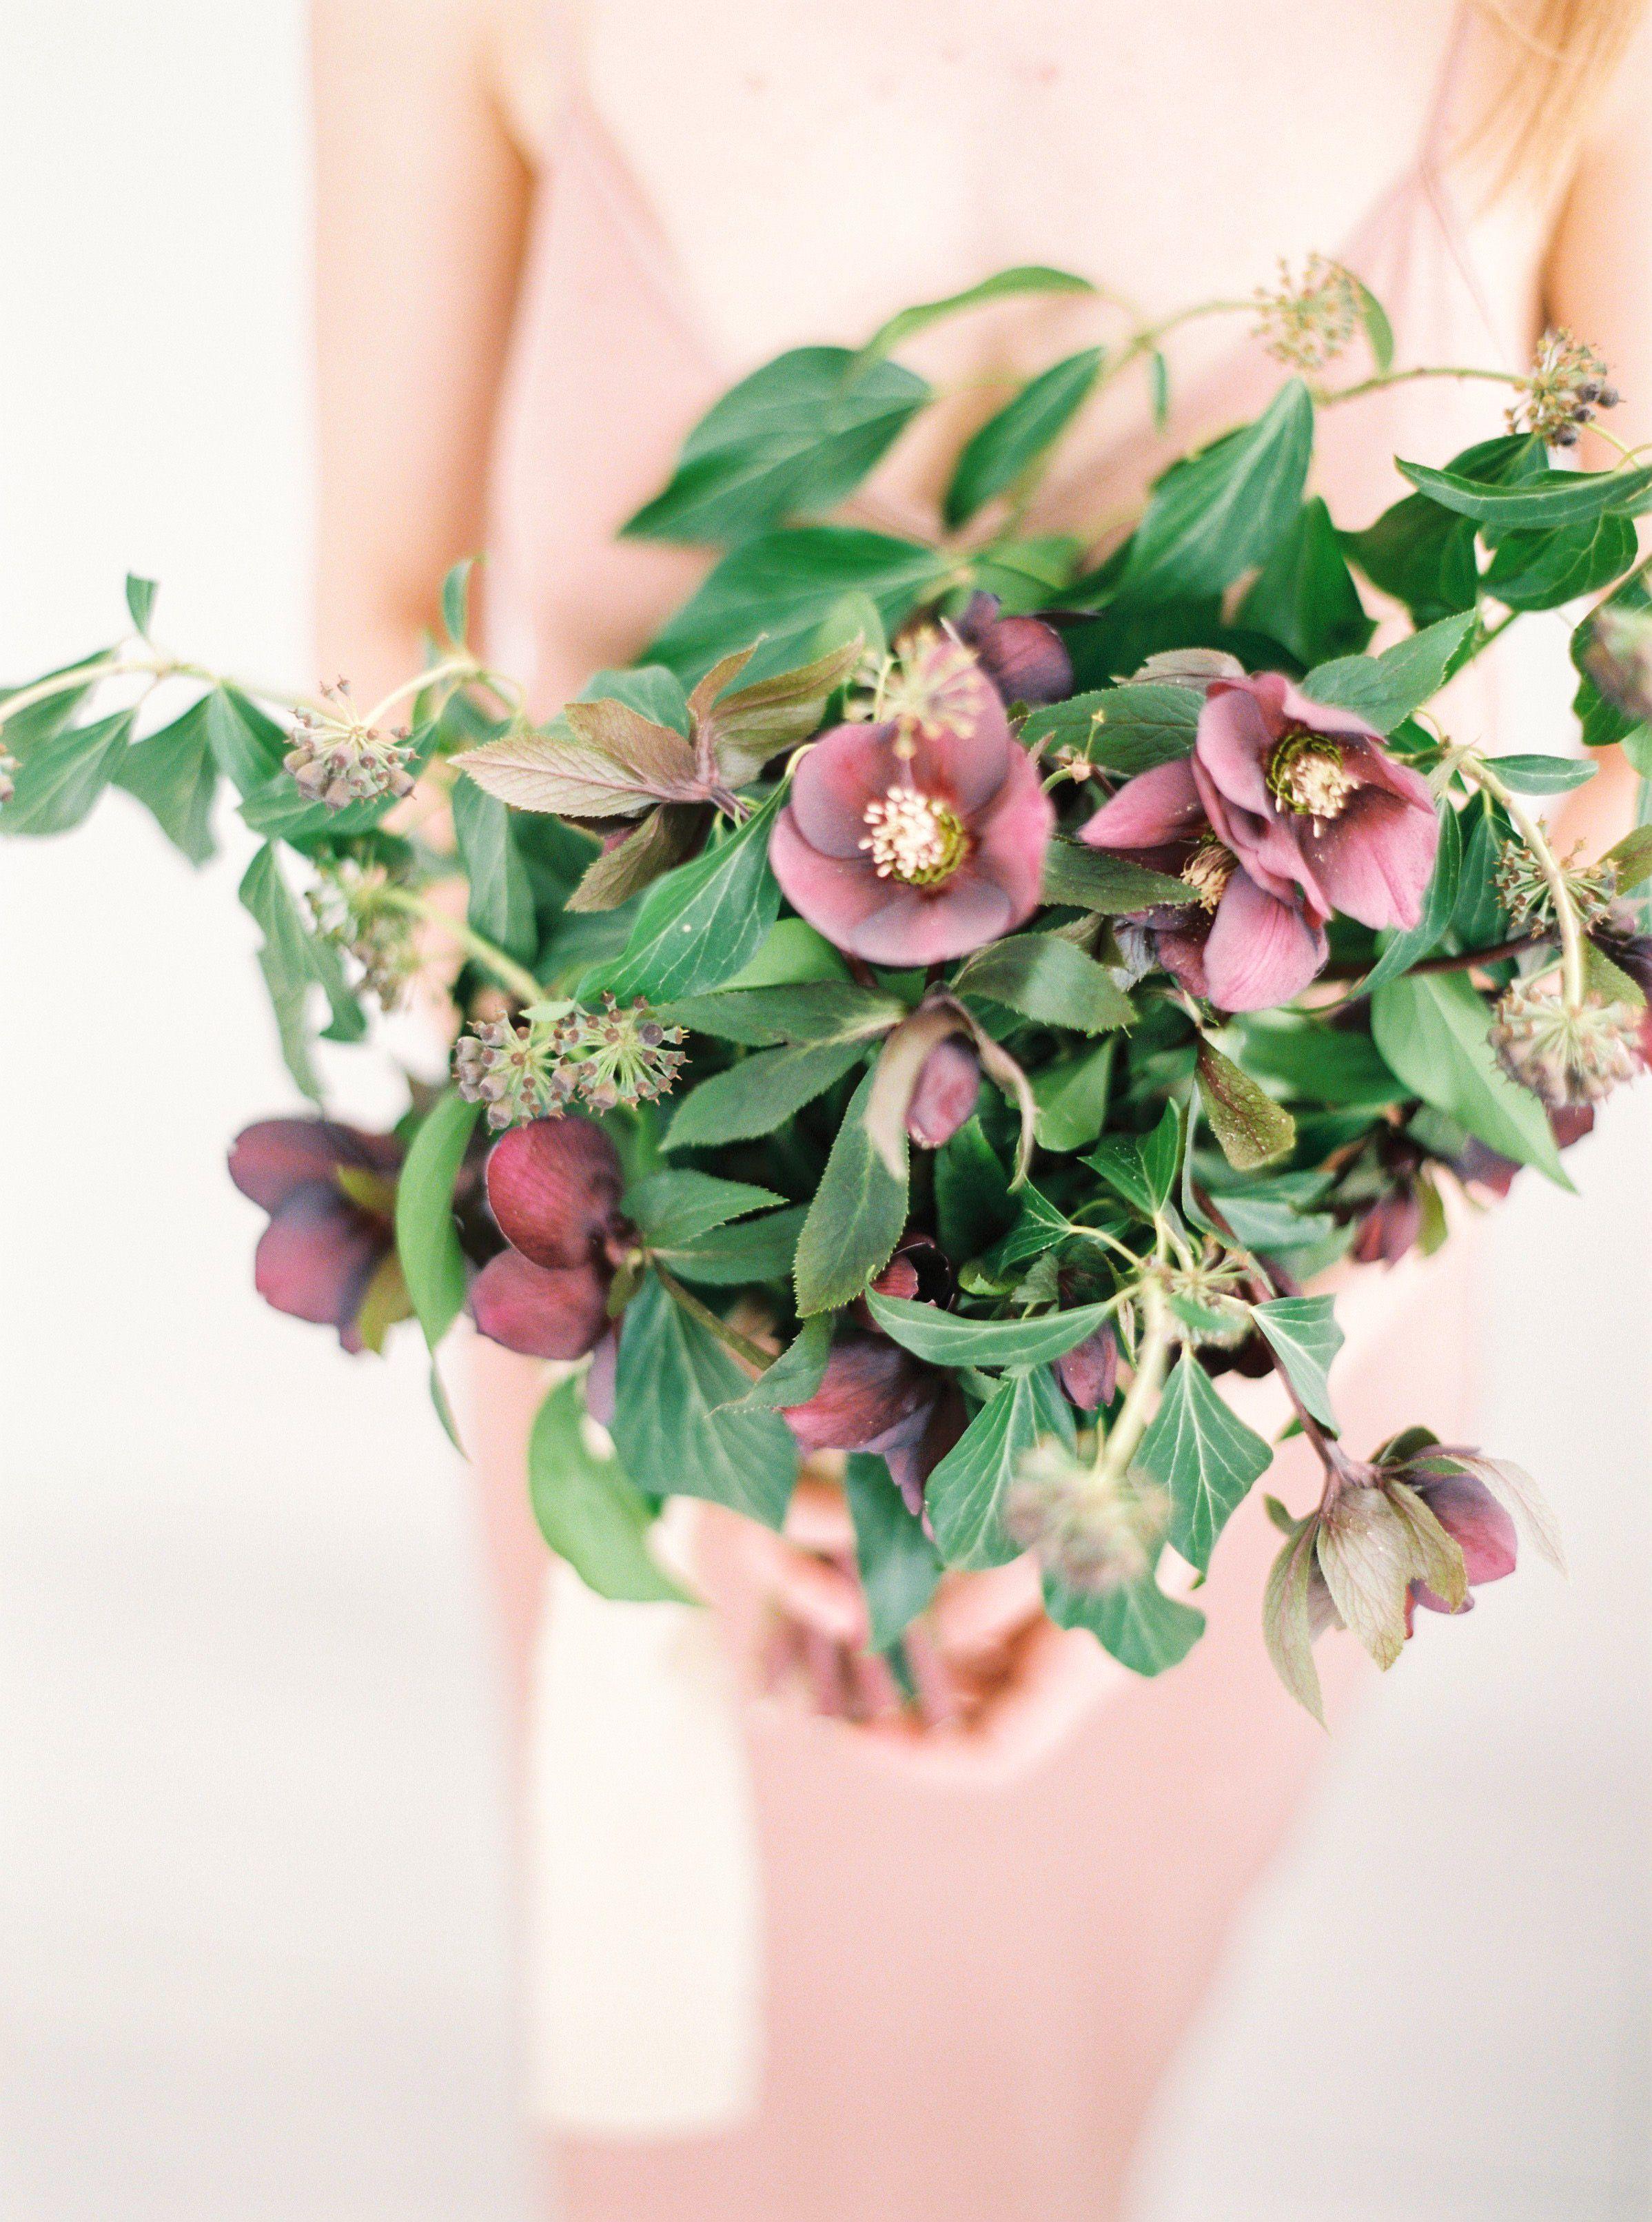 Bukiet Slubny Z Ciemiernikow Bukiet Na Slub Zima Minimal Wedding Bouquet For Winter Wedding Hellebore Bride Bouquet Floral Floral Wreath Bouquet